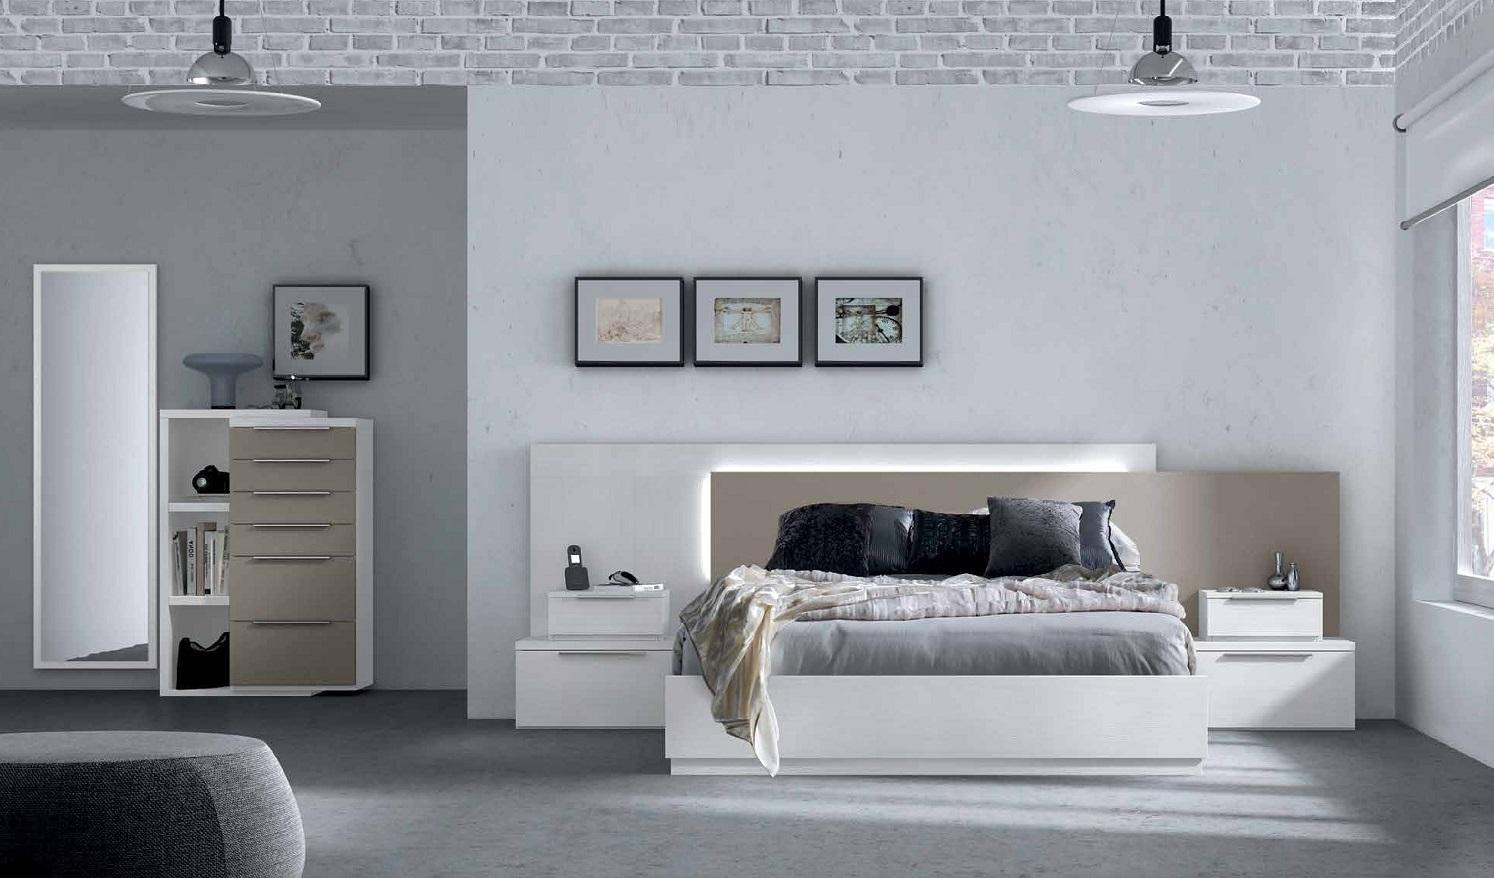 chambre emjelu sas showroom chez soi design. Black Bedroom Furniture Sets. Home Design Ideas